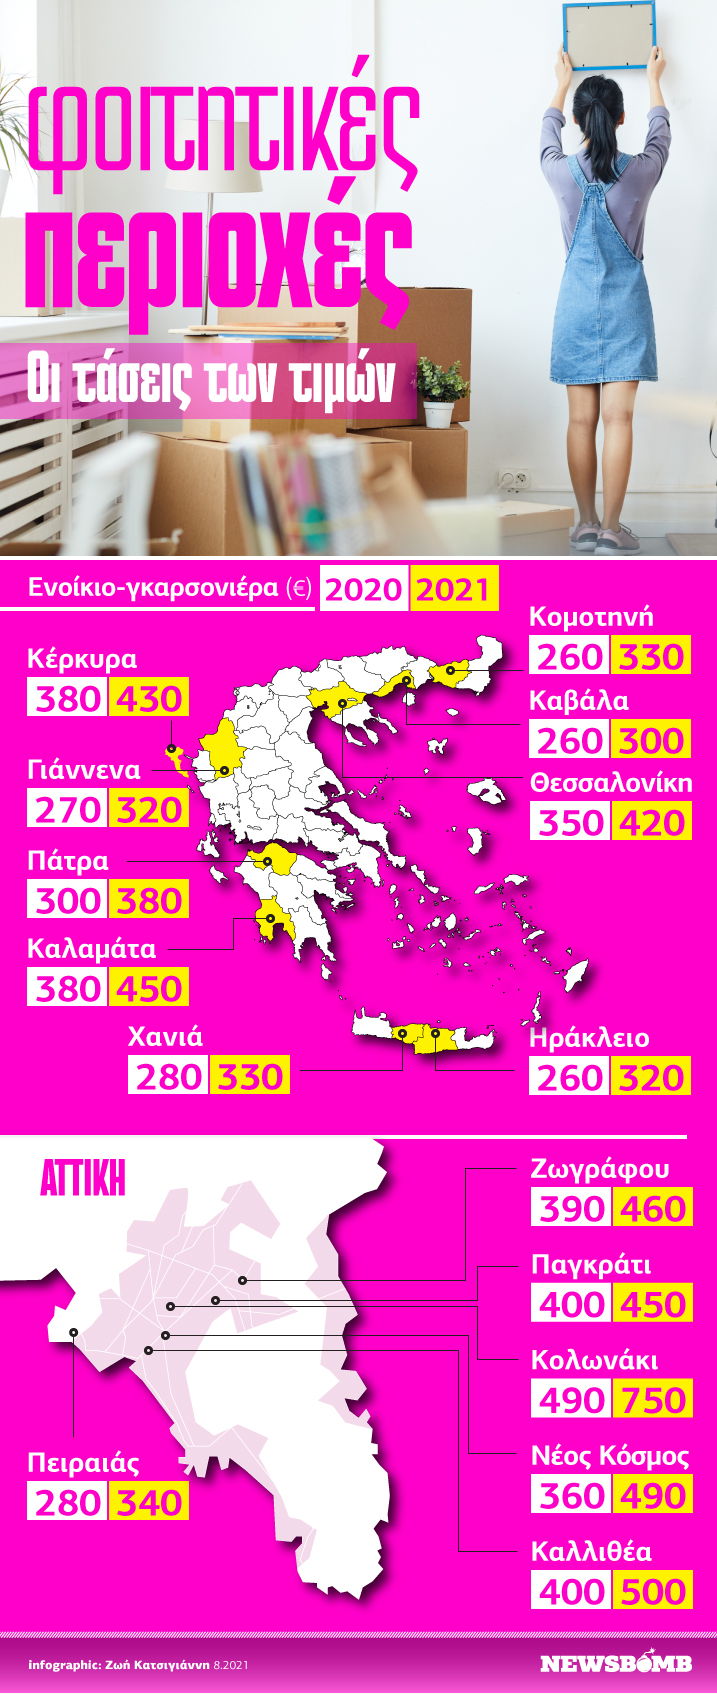 Infographic τάσεις τιμών φοιτητικά σπίτια